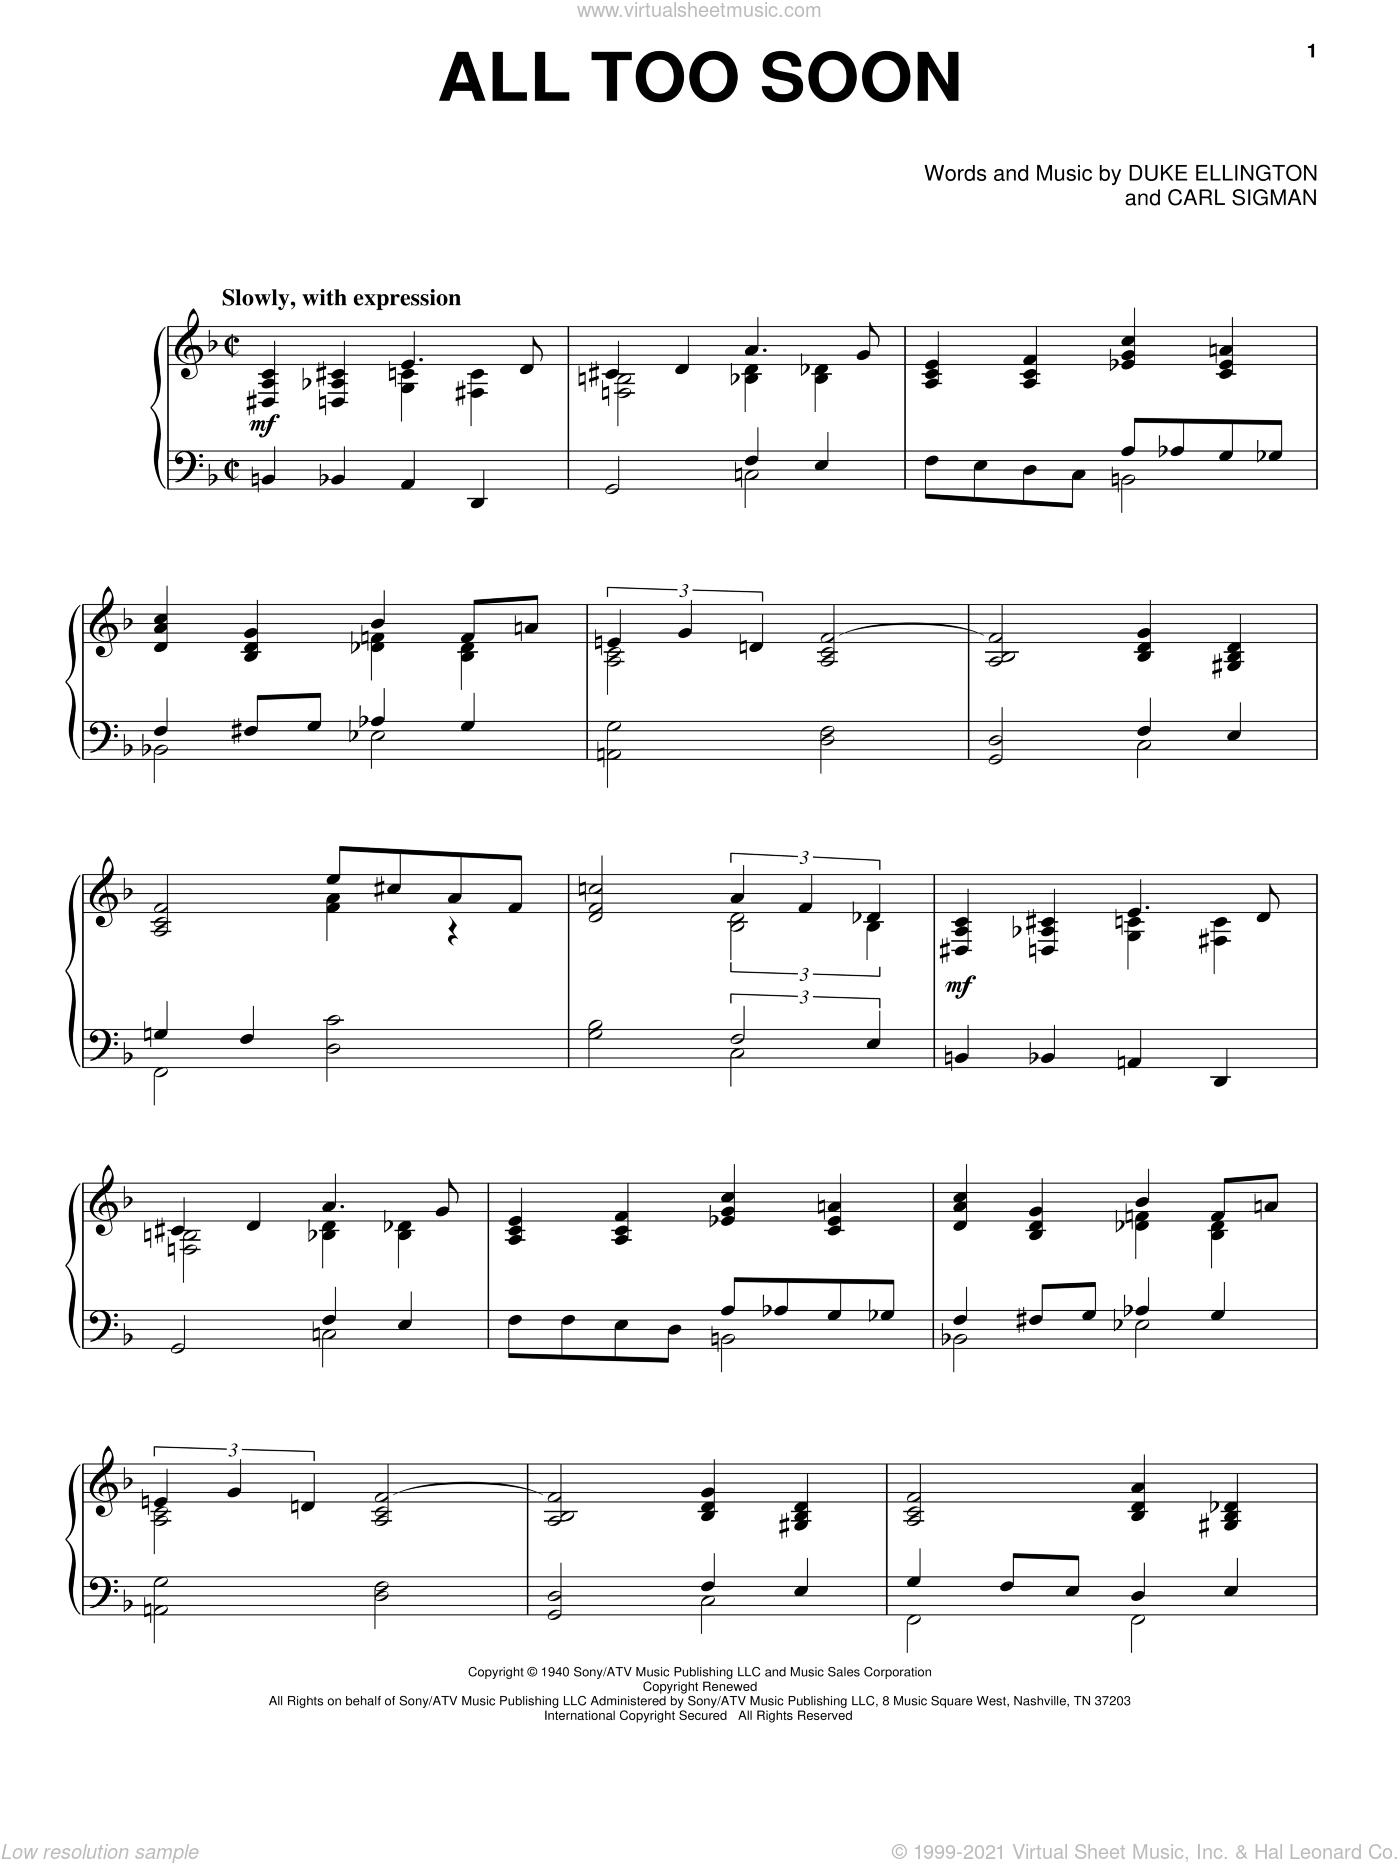 All Too Soon sheet music for piano solo by Duke Ellington and Carl Sigman, intermediate skill level